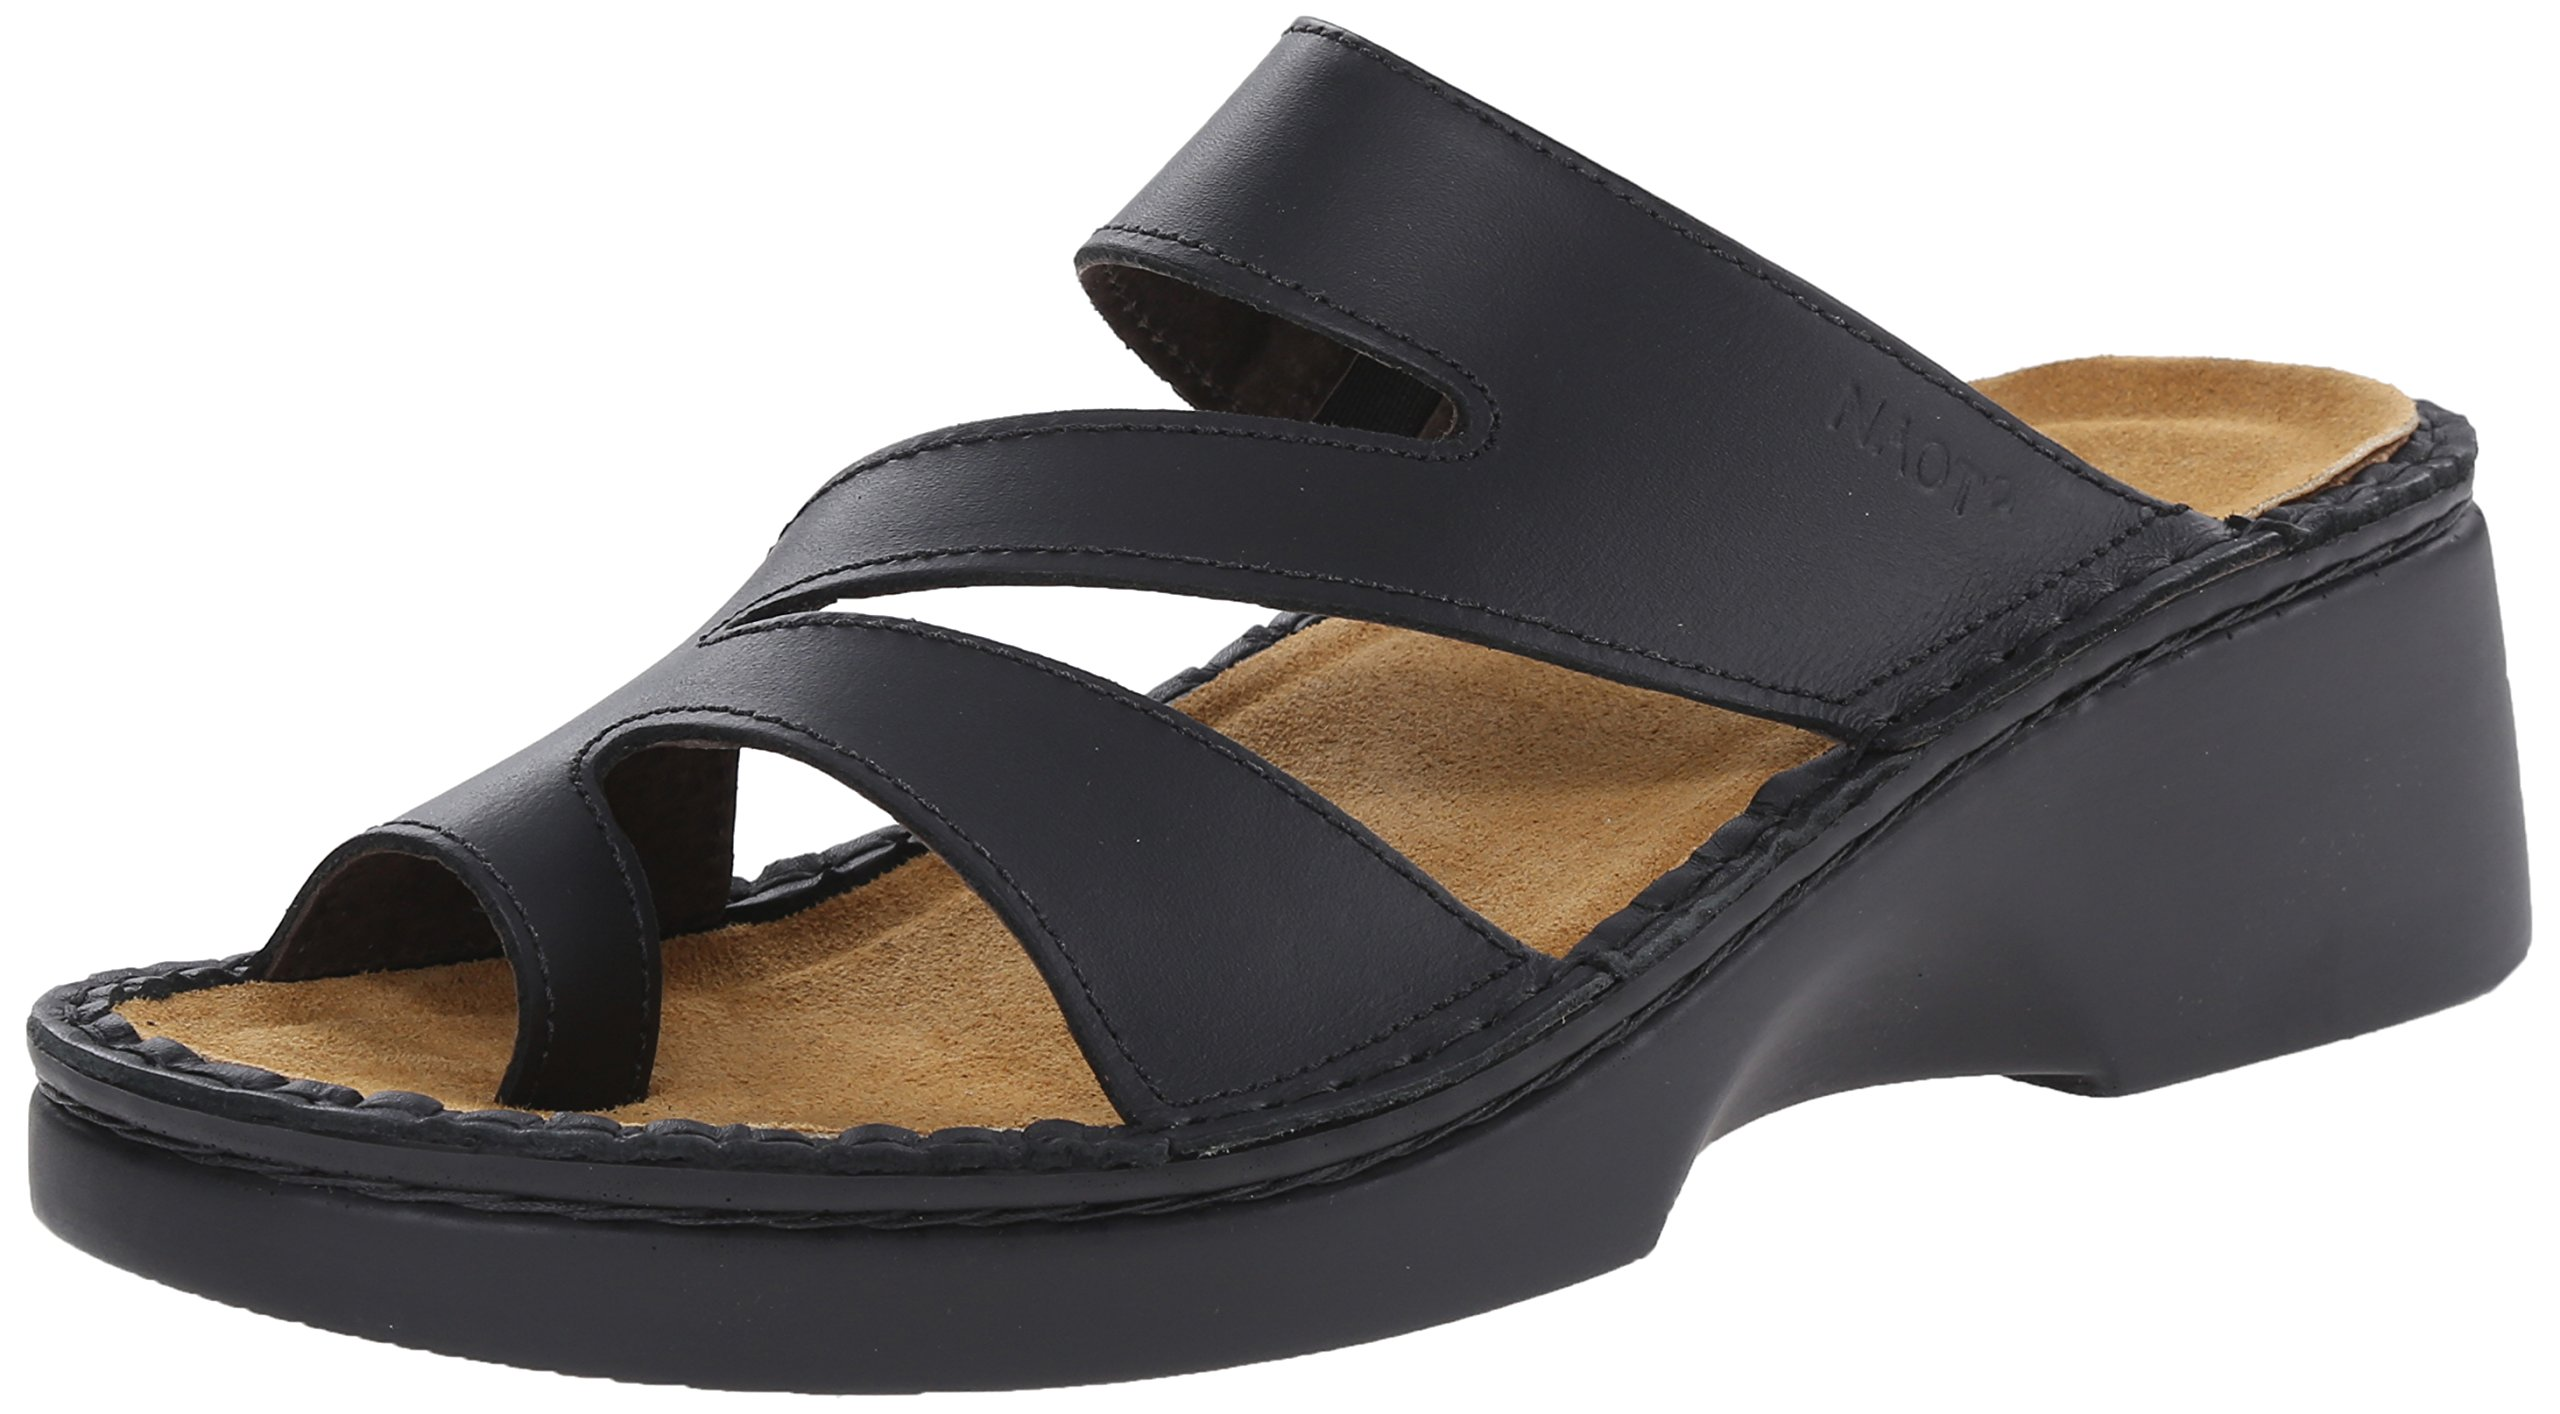 Naot Women's Monterey Wedge Sandal, Black Matte Leather, 40 EU/8.5-9 M US